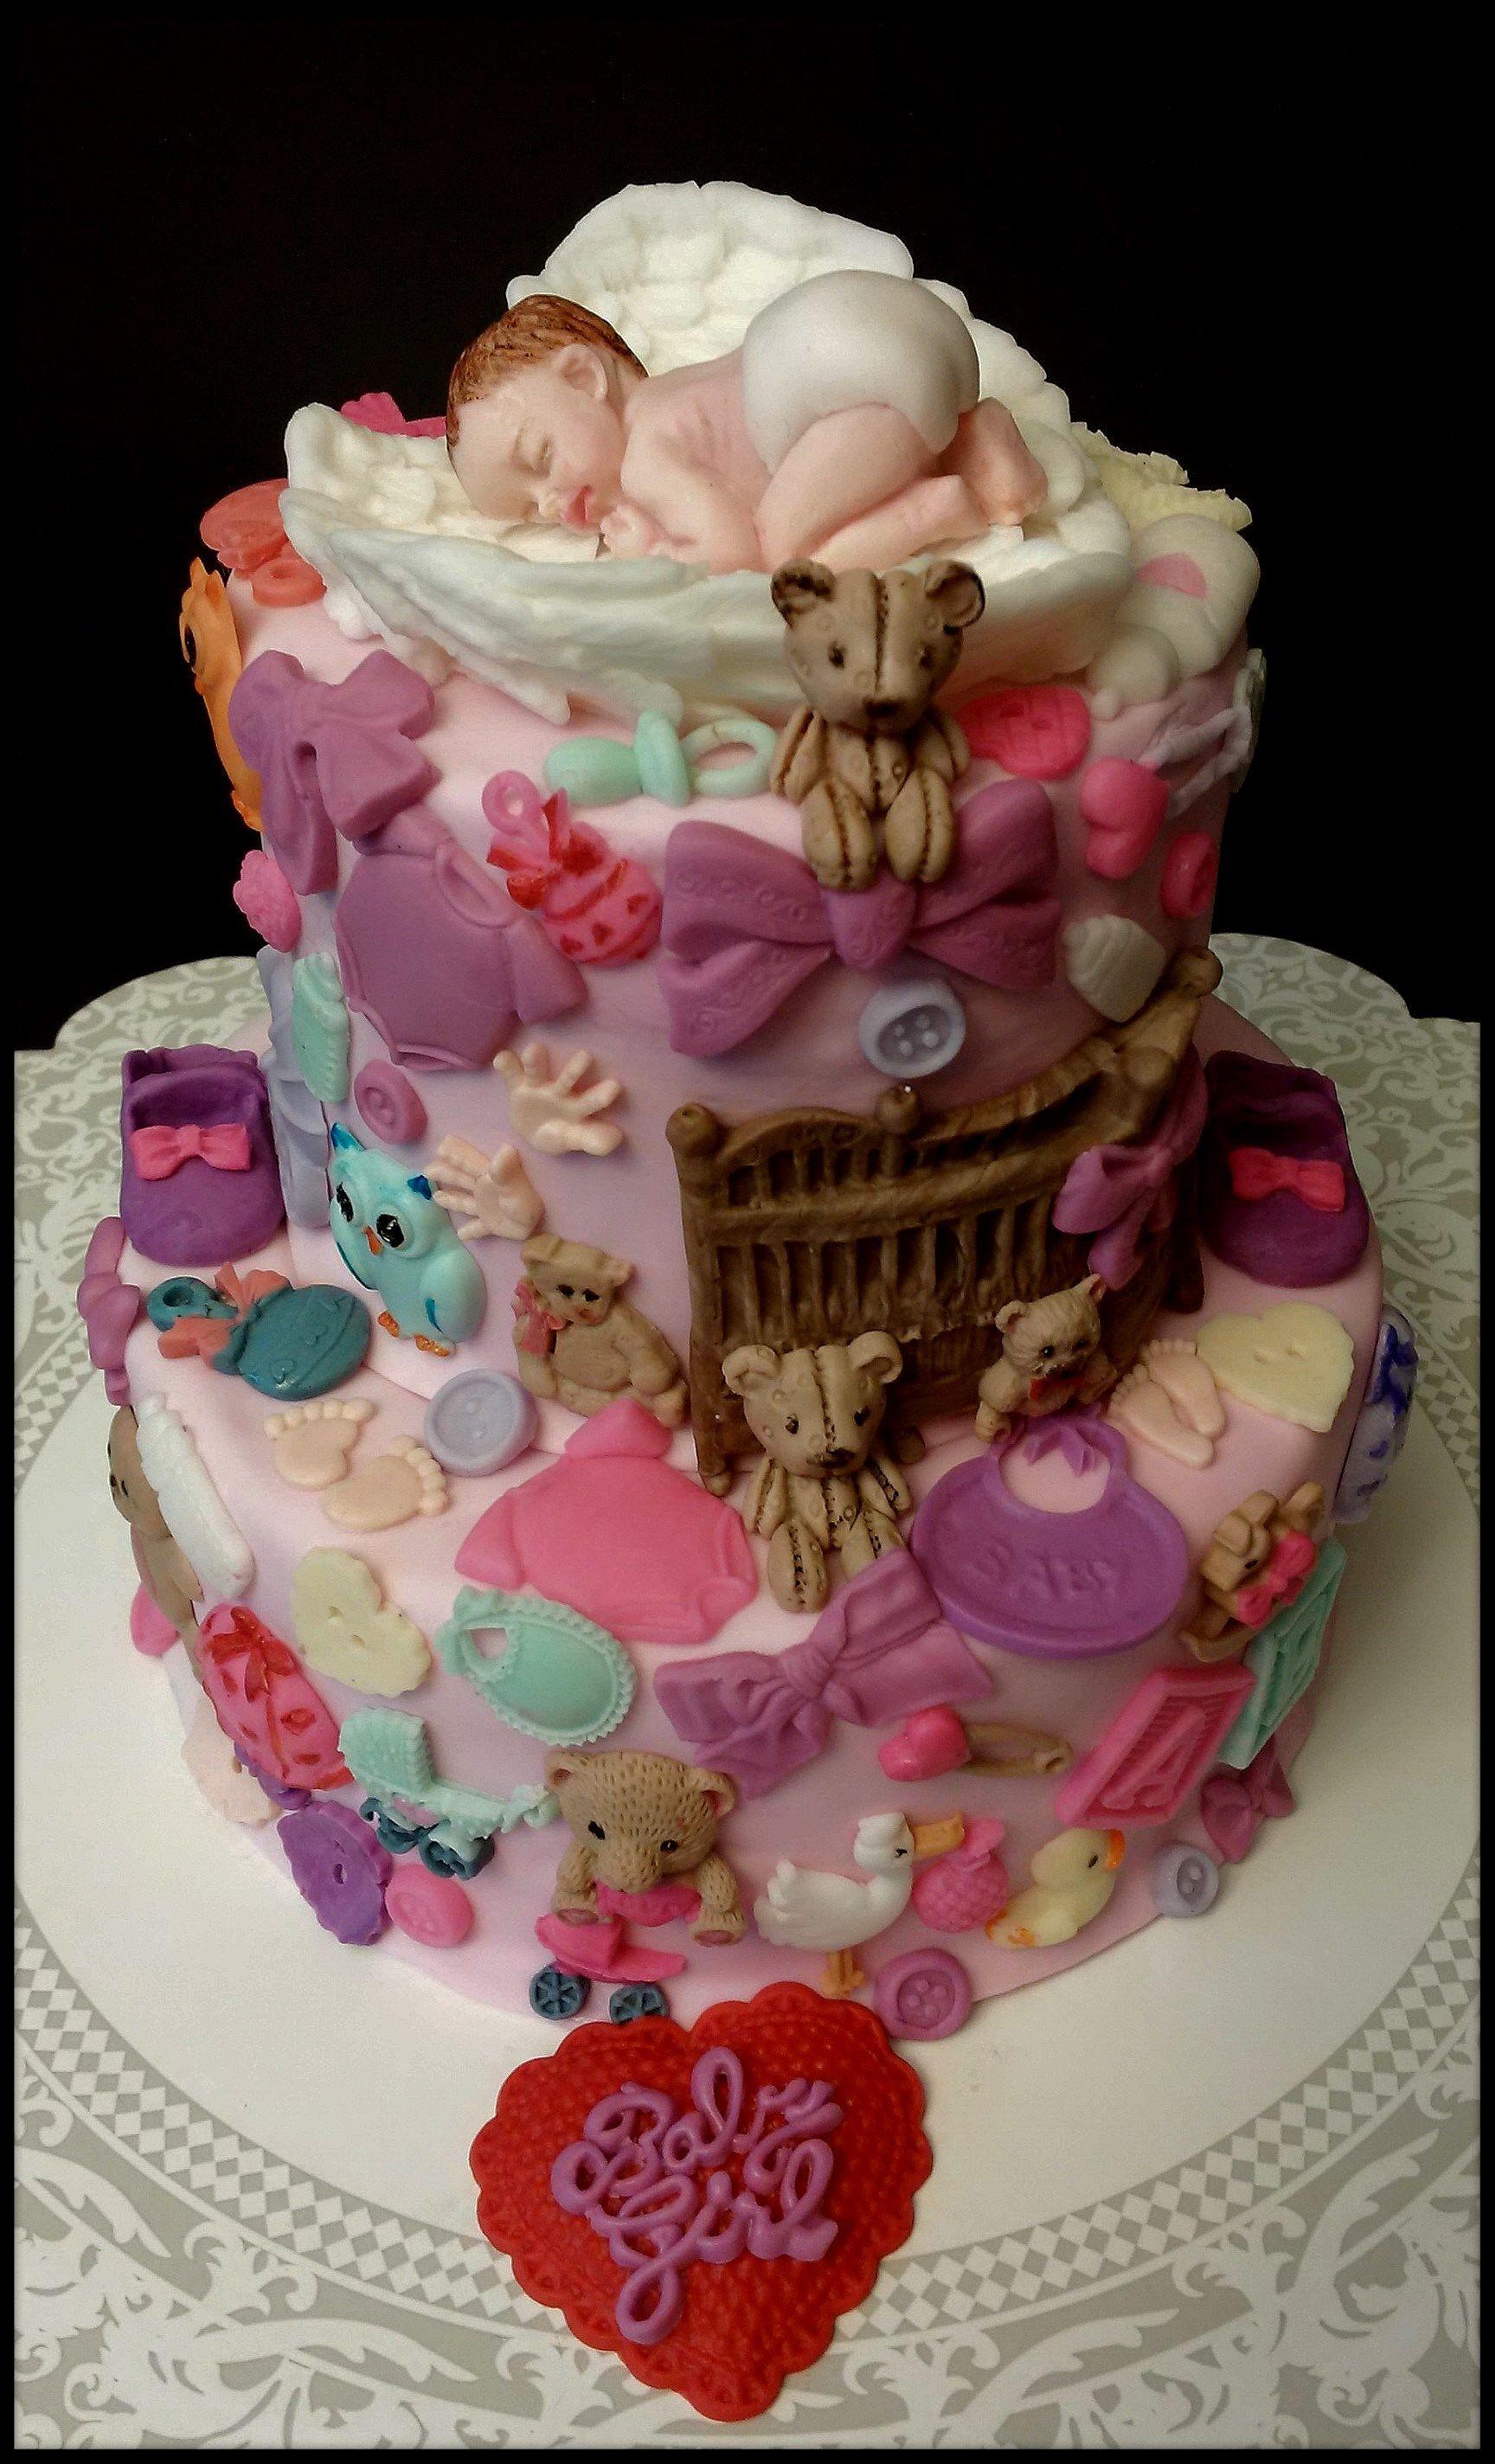 baby cakes bakery toronto